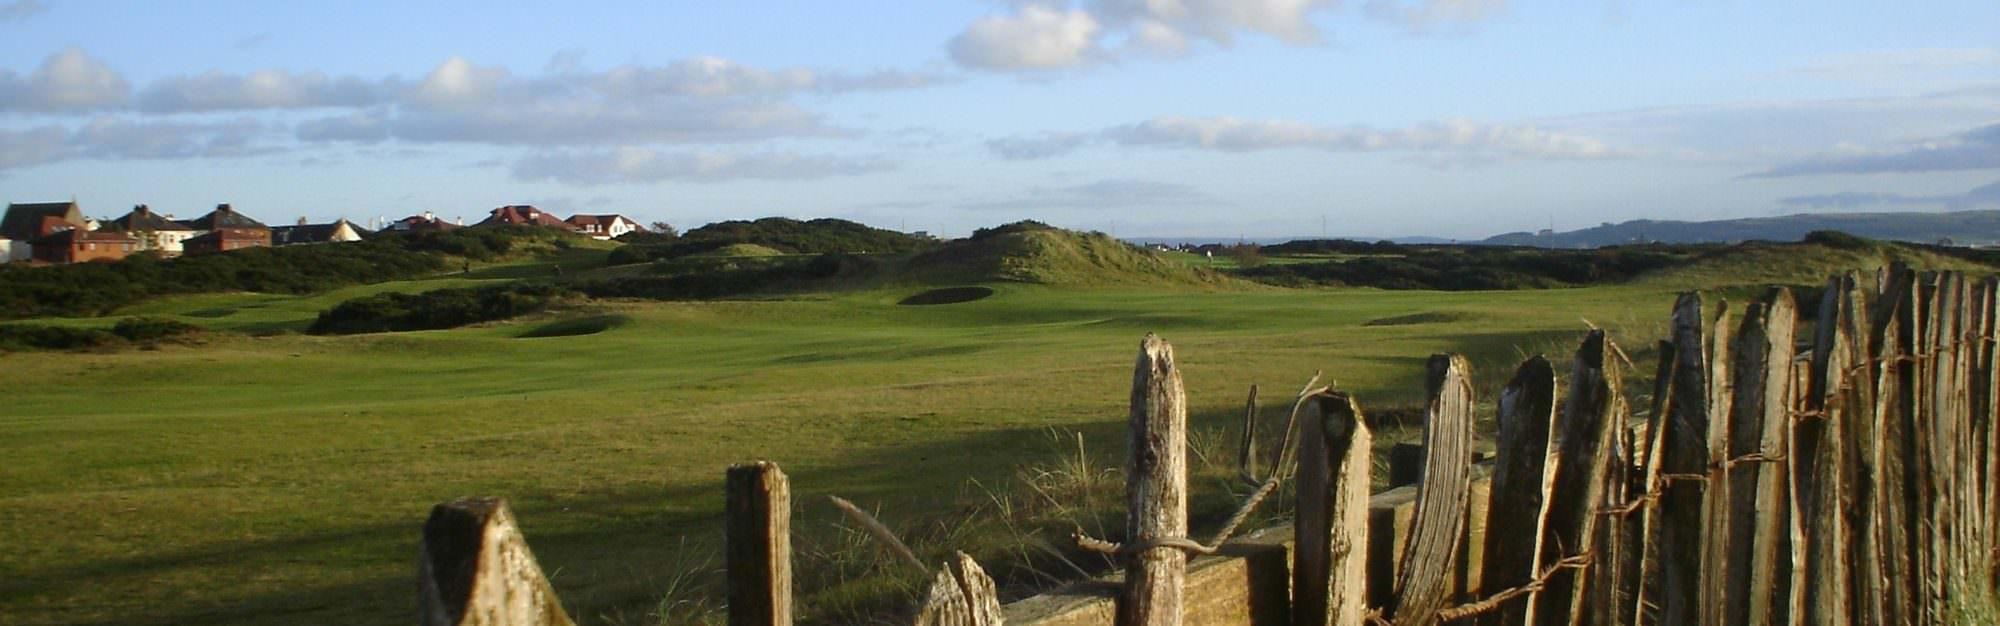 NCG Top 100s Scotland: an informed area guide